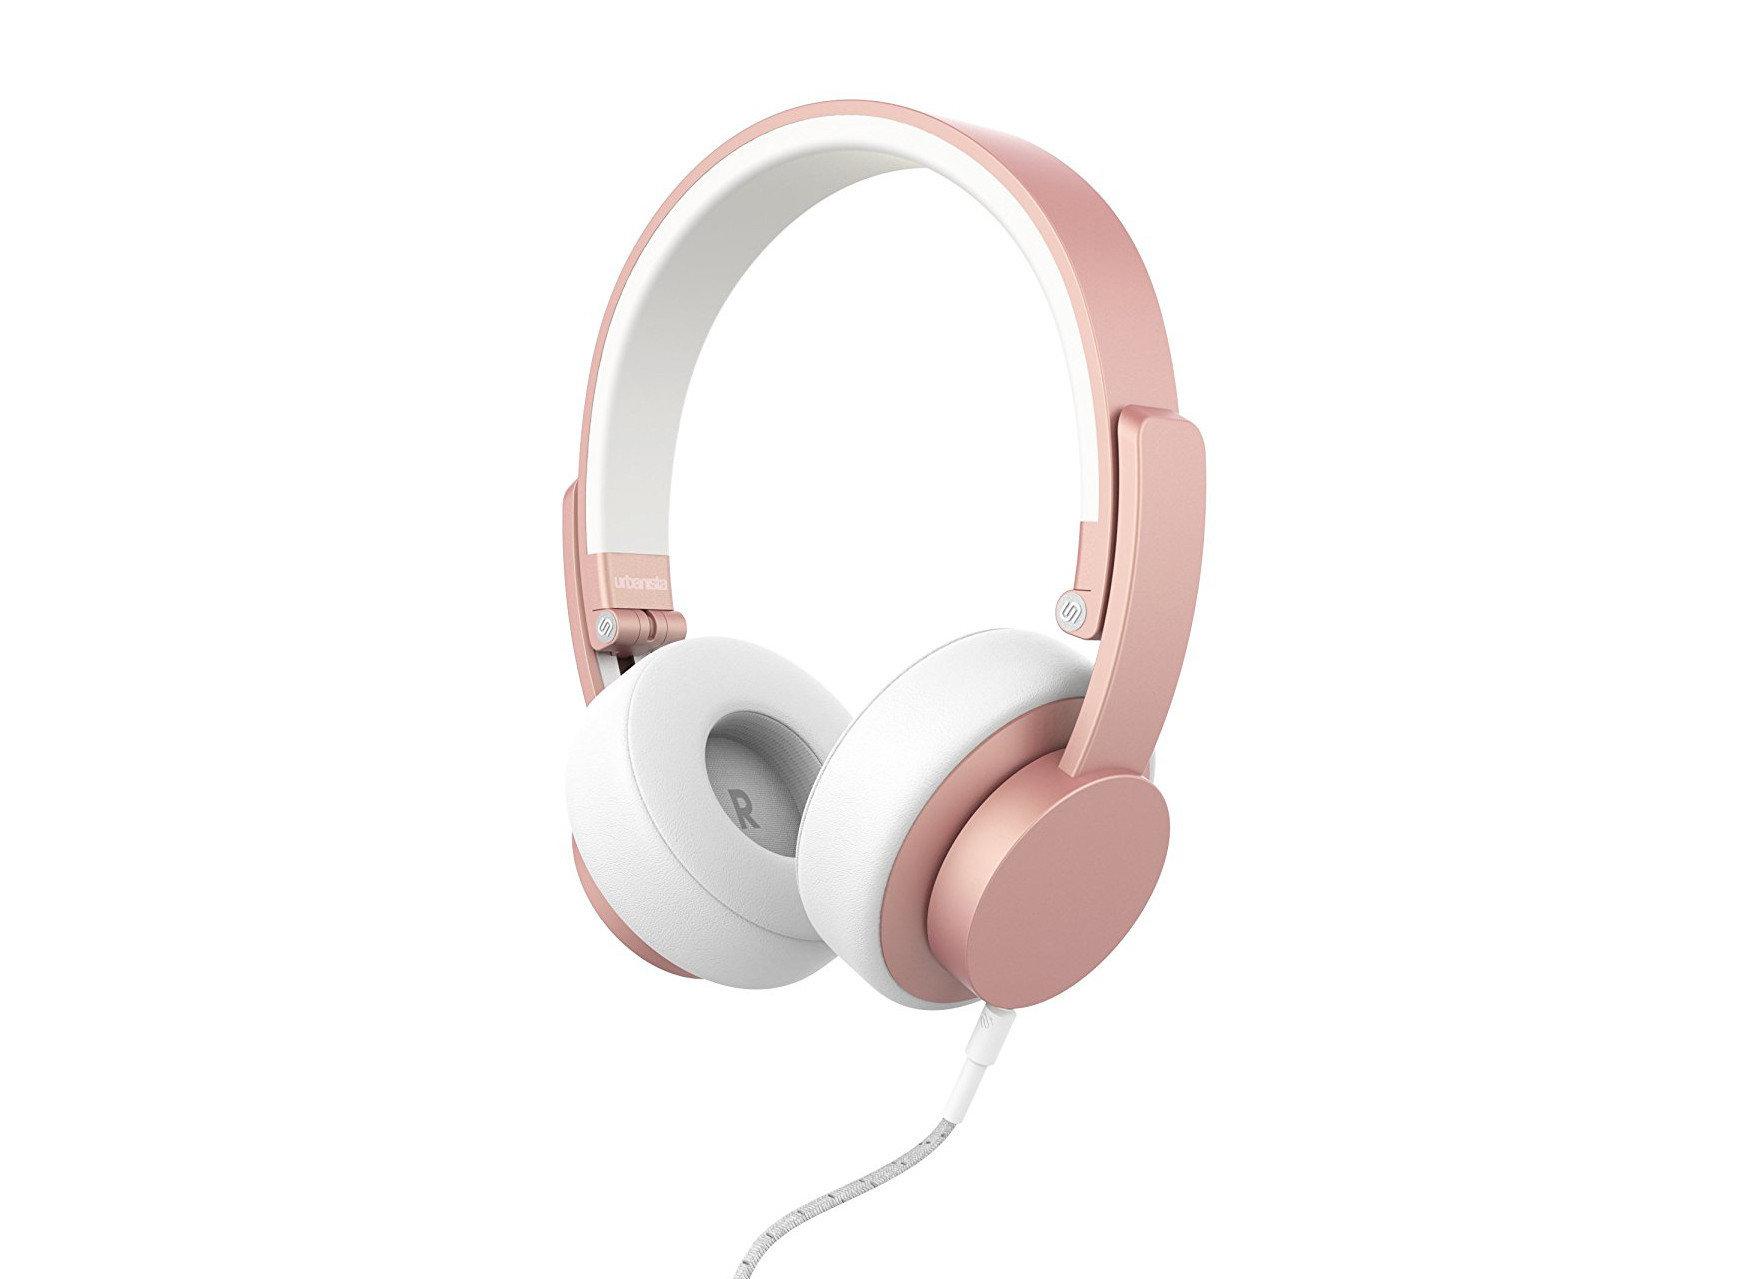 Style + Design headphones audio equipment earphone technology audio electronic device headset product design product